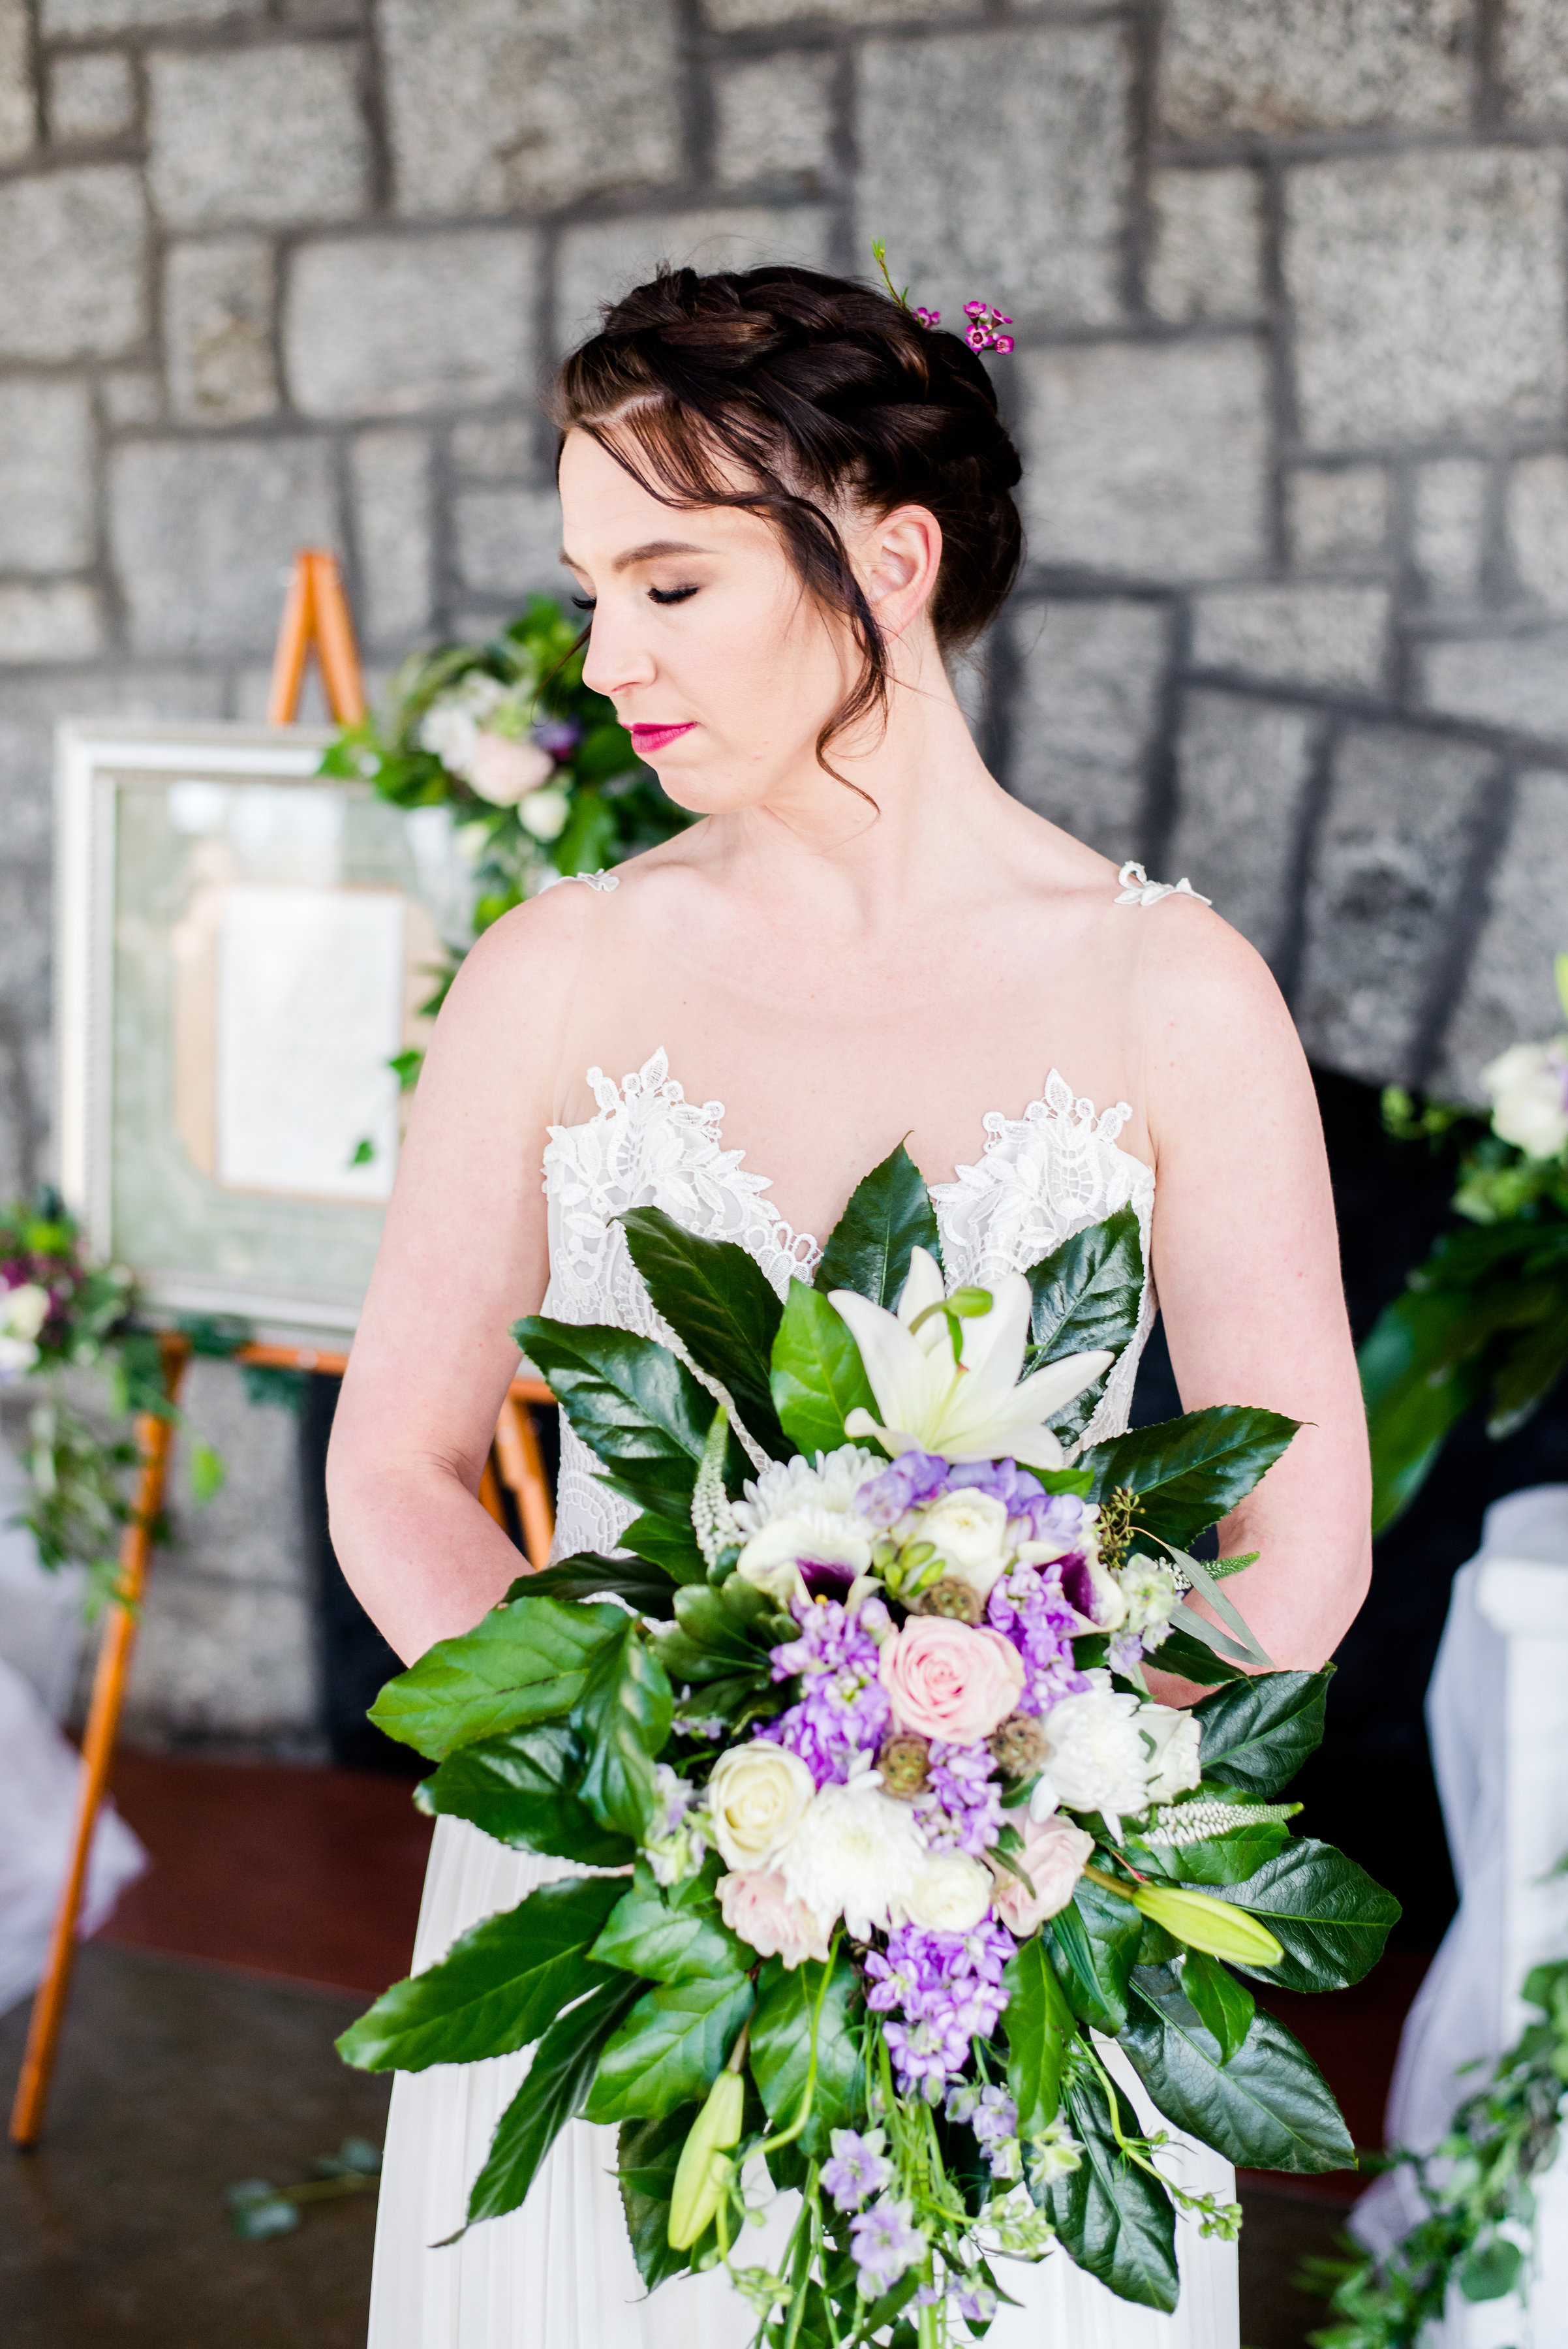 Baldwin-School-Wedding-Photographer-Event-Venue-Pennsylvania-Mainline-Andrea-Krout-Photography-442.jpg